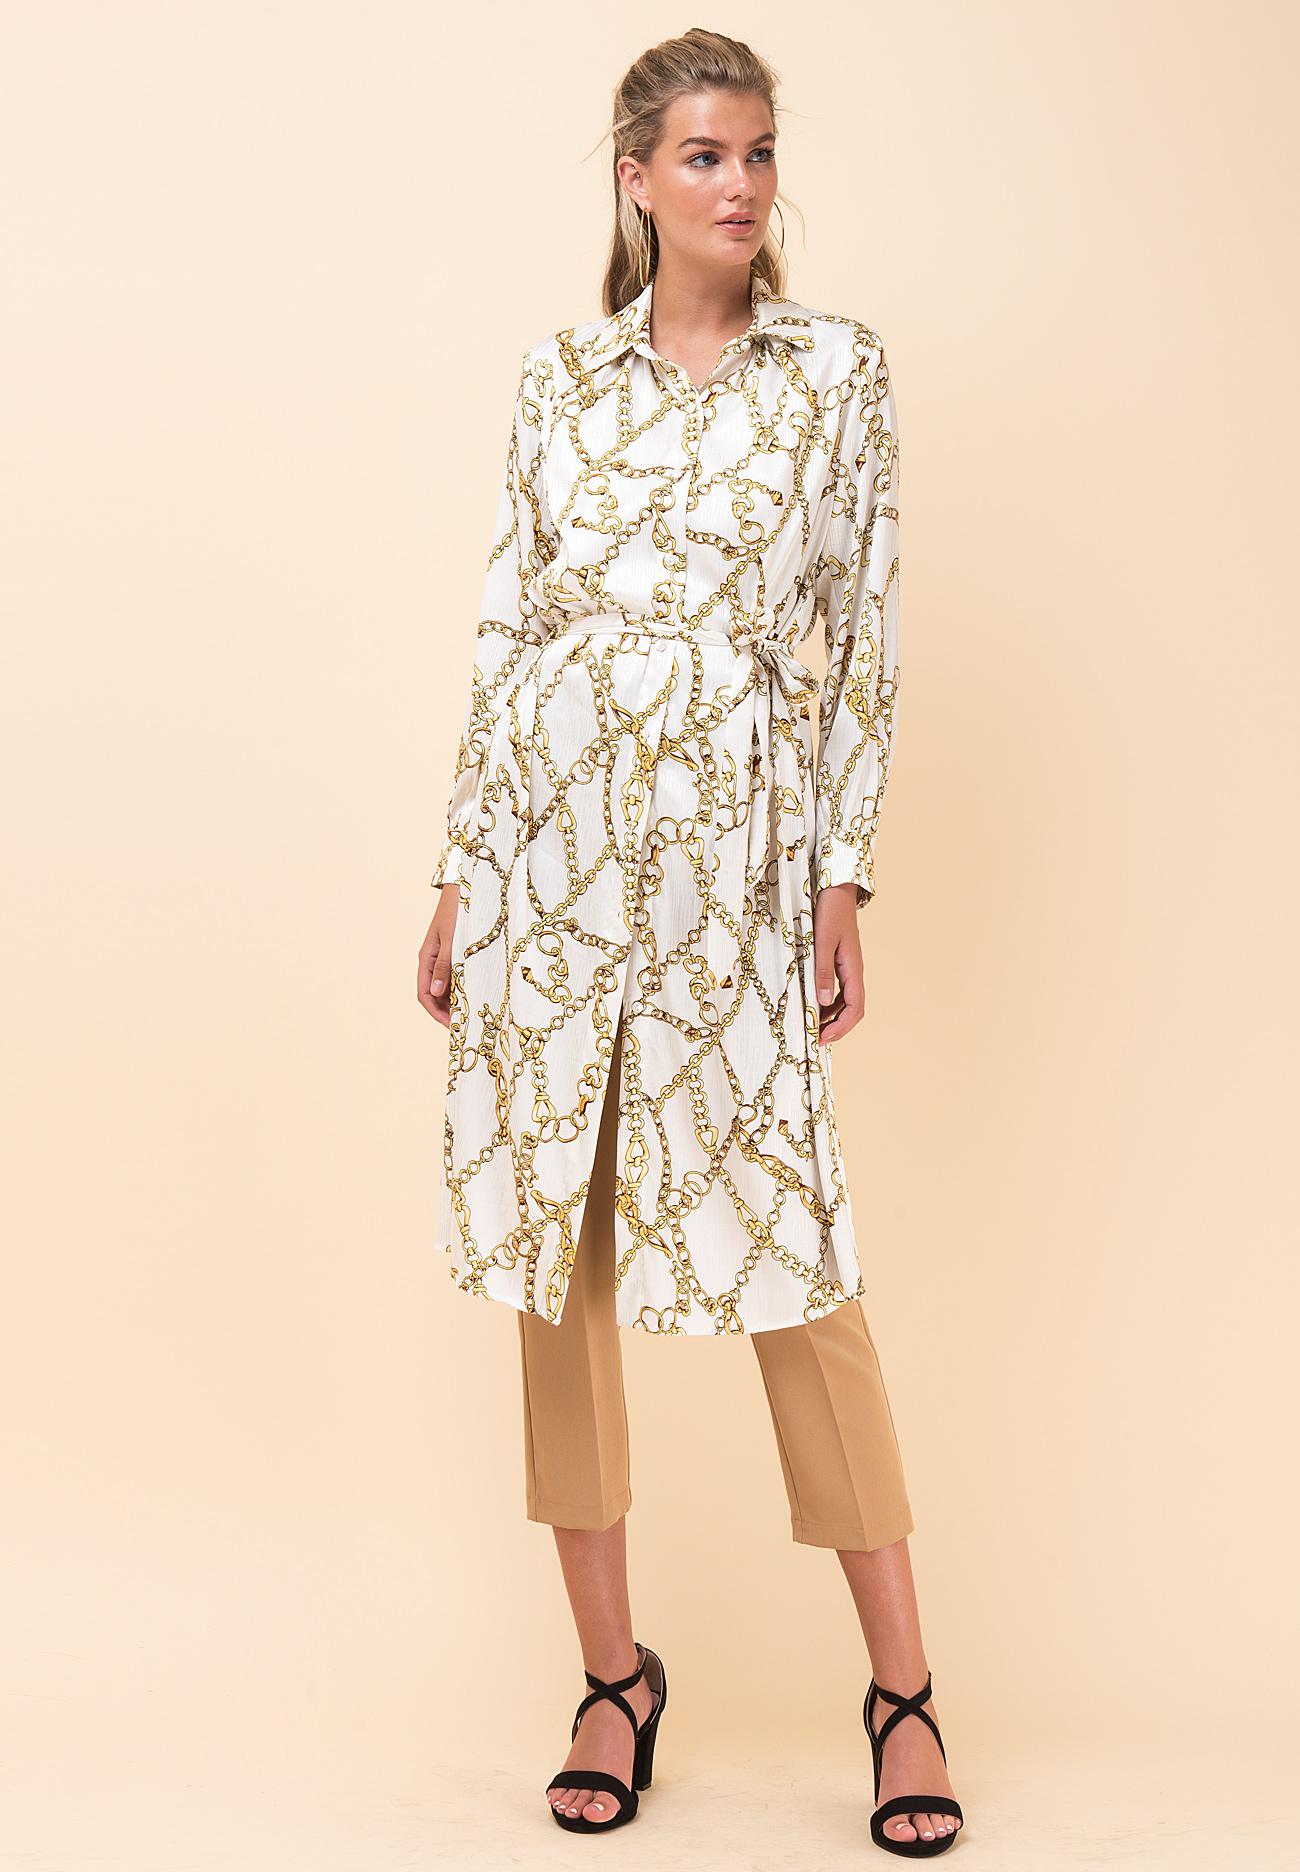 68dca2531a40 Φόρεμα με τύπωμα αλυσίδες σε στιλ πουκάμισο - ZIC ZAC